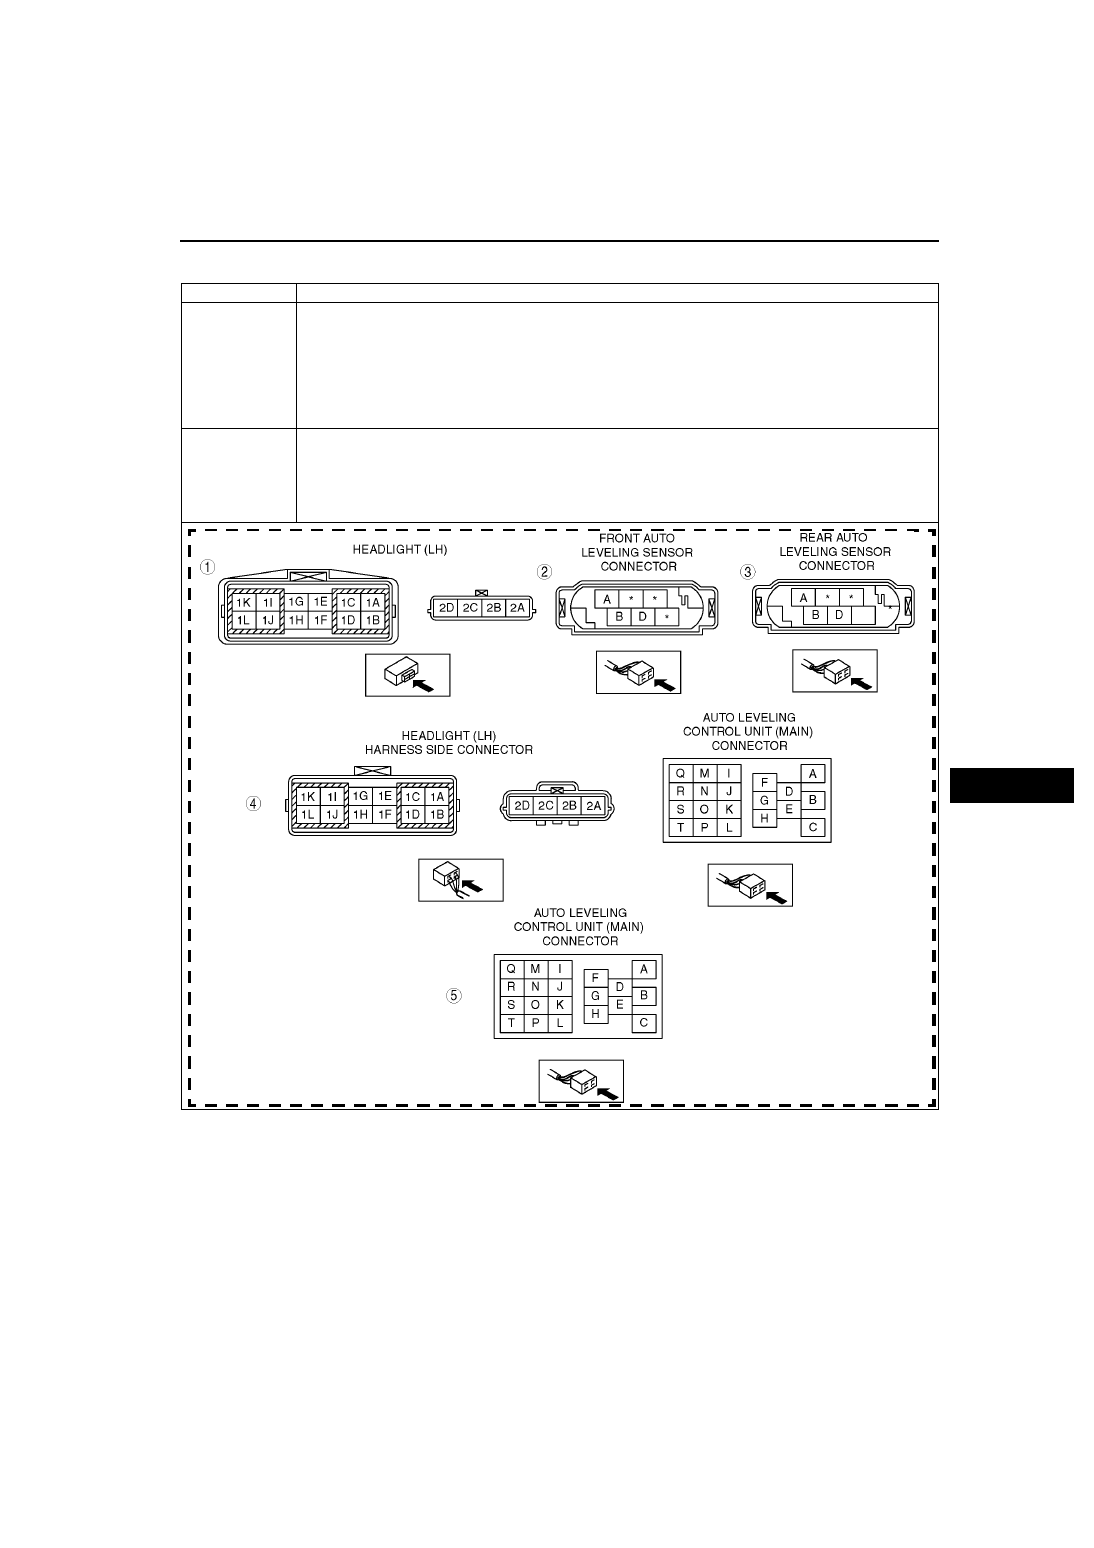 Mazda 3 Service Manual: Auto Leveling Sensor Inspection